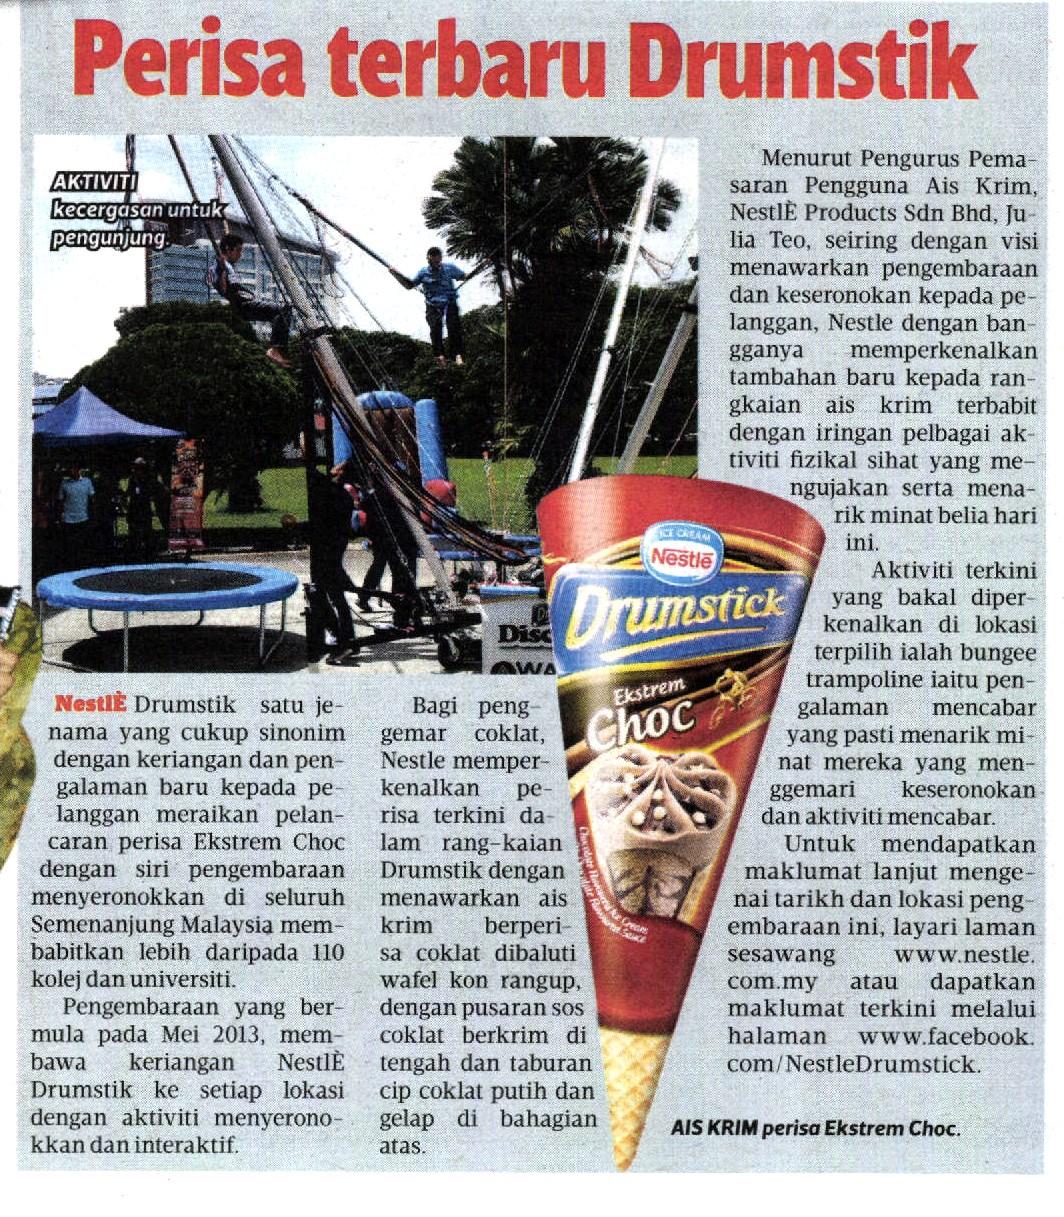 23 July 2013 - Harian Metro - Newspaper